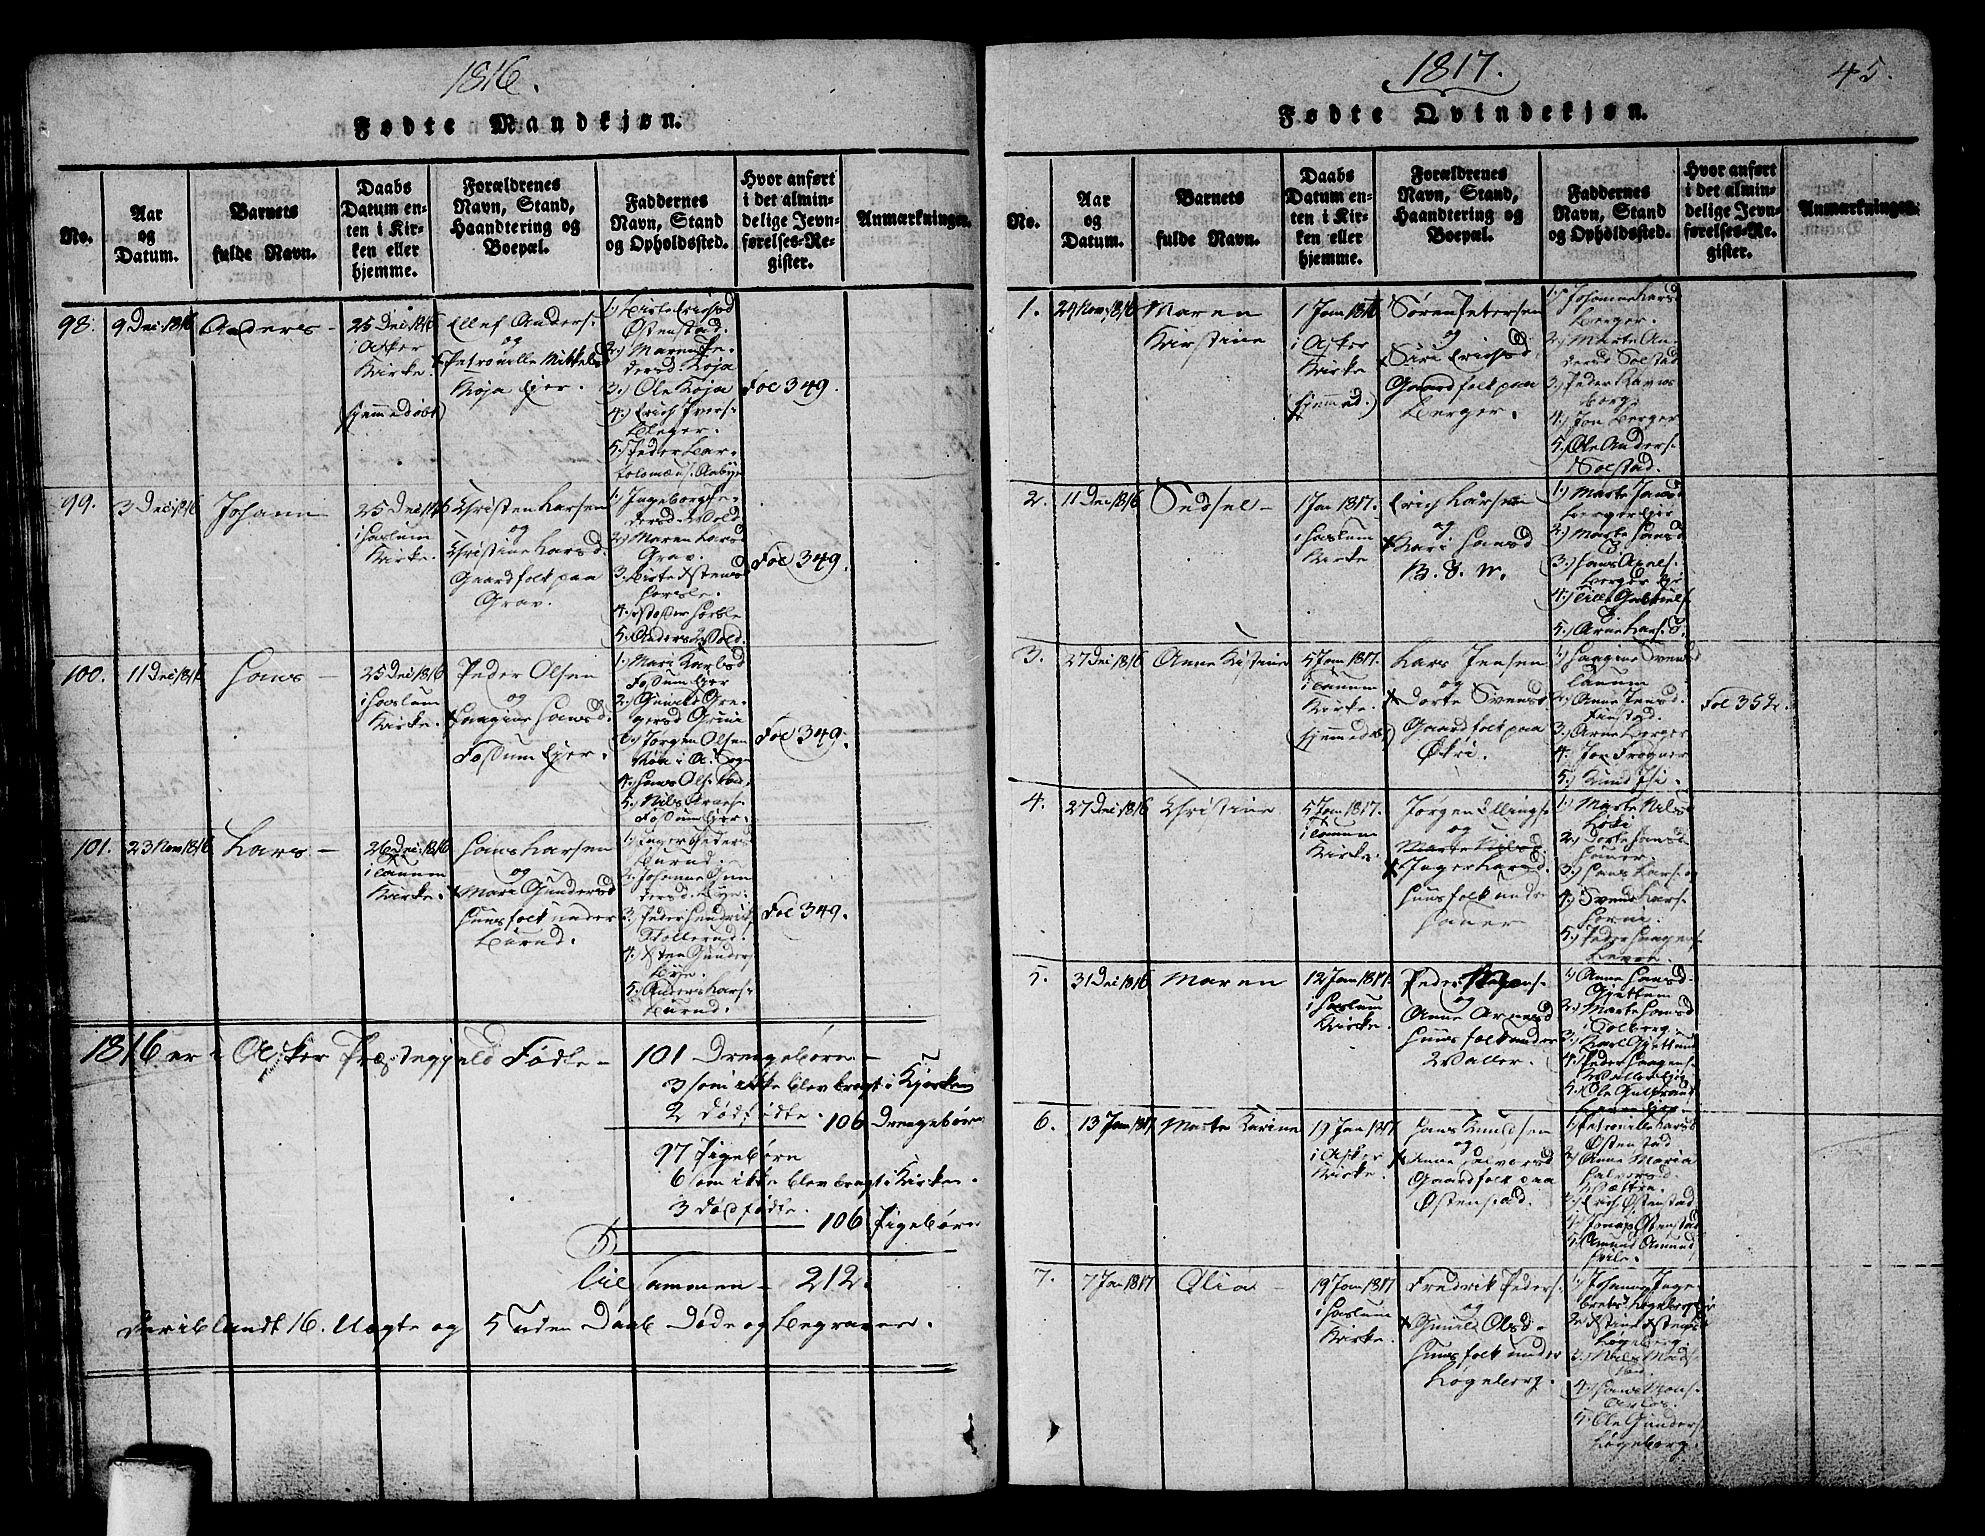 SAO, Asker prestekontor Kirkebøker, G/Ga/L0001: Klokkerbok nr. I 1, 1814-1830, s. 45